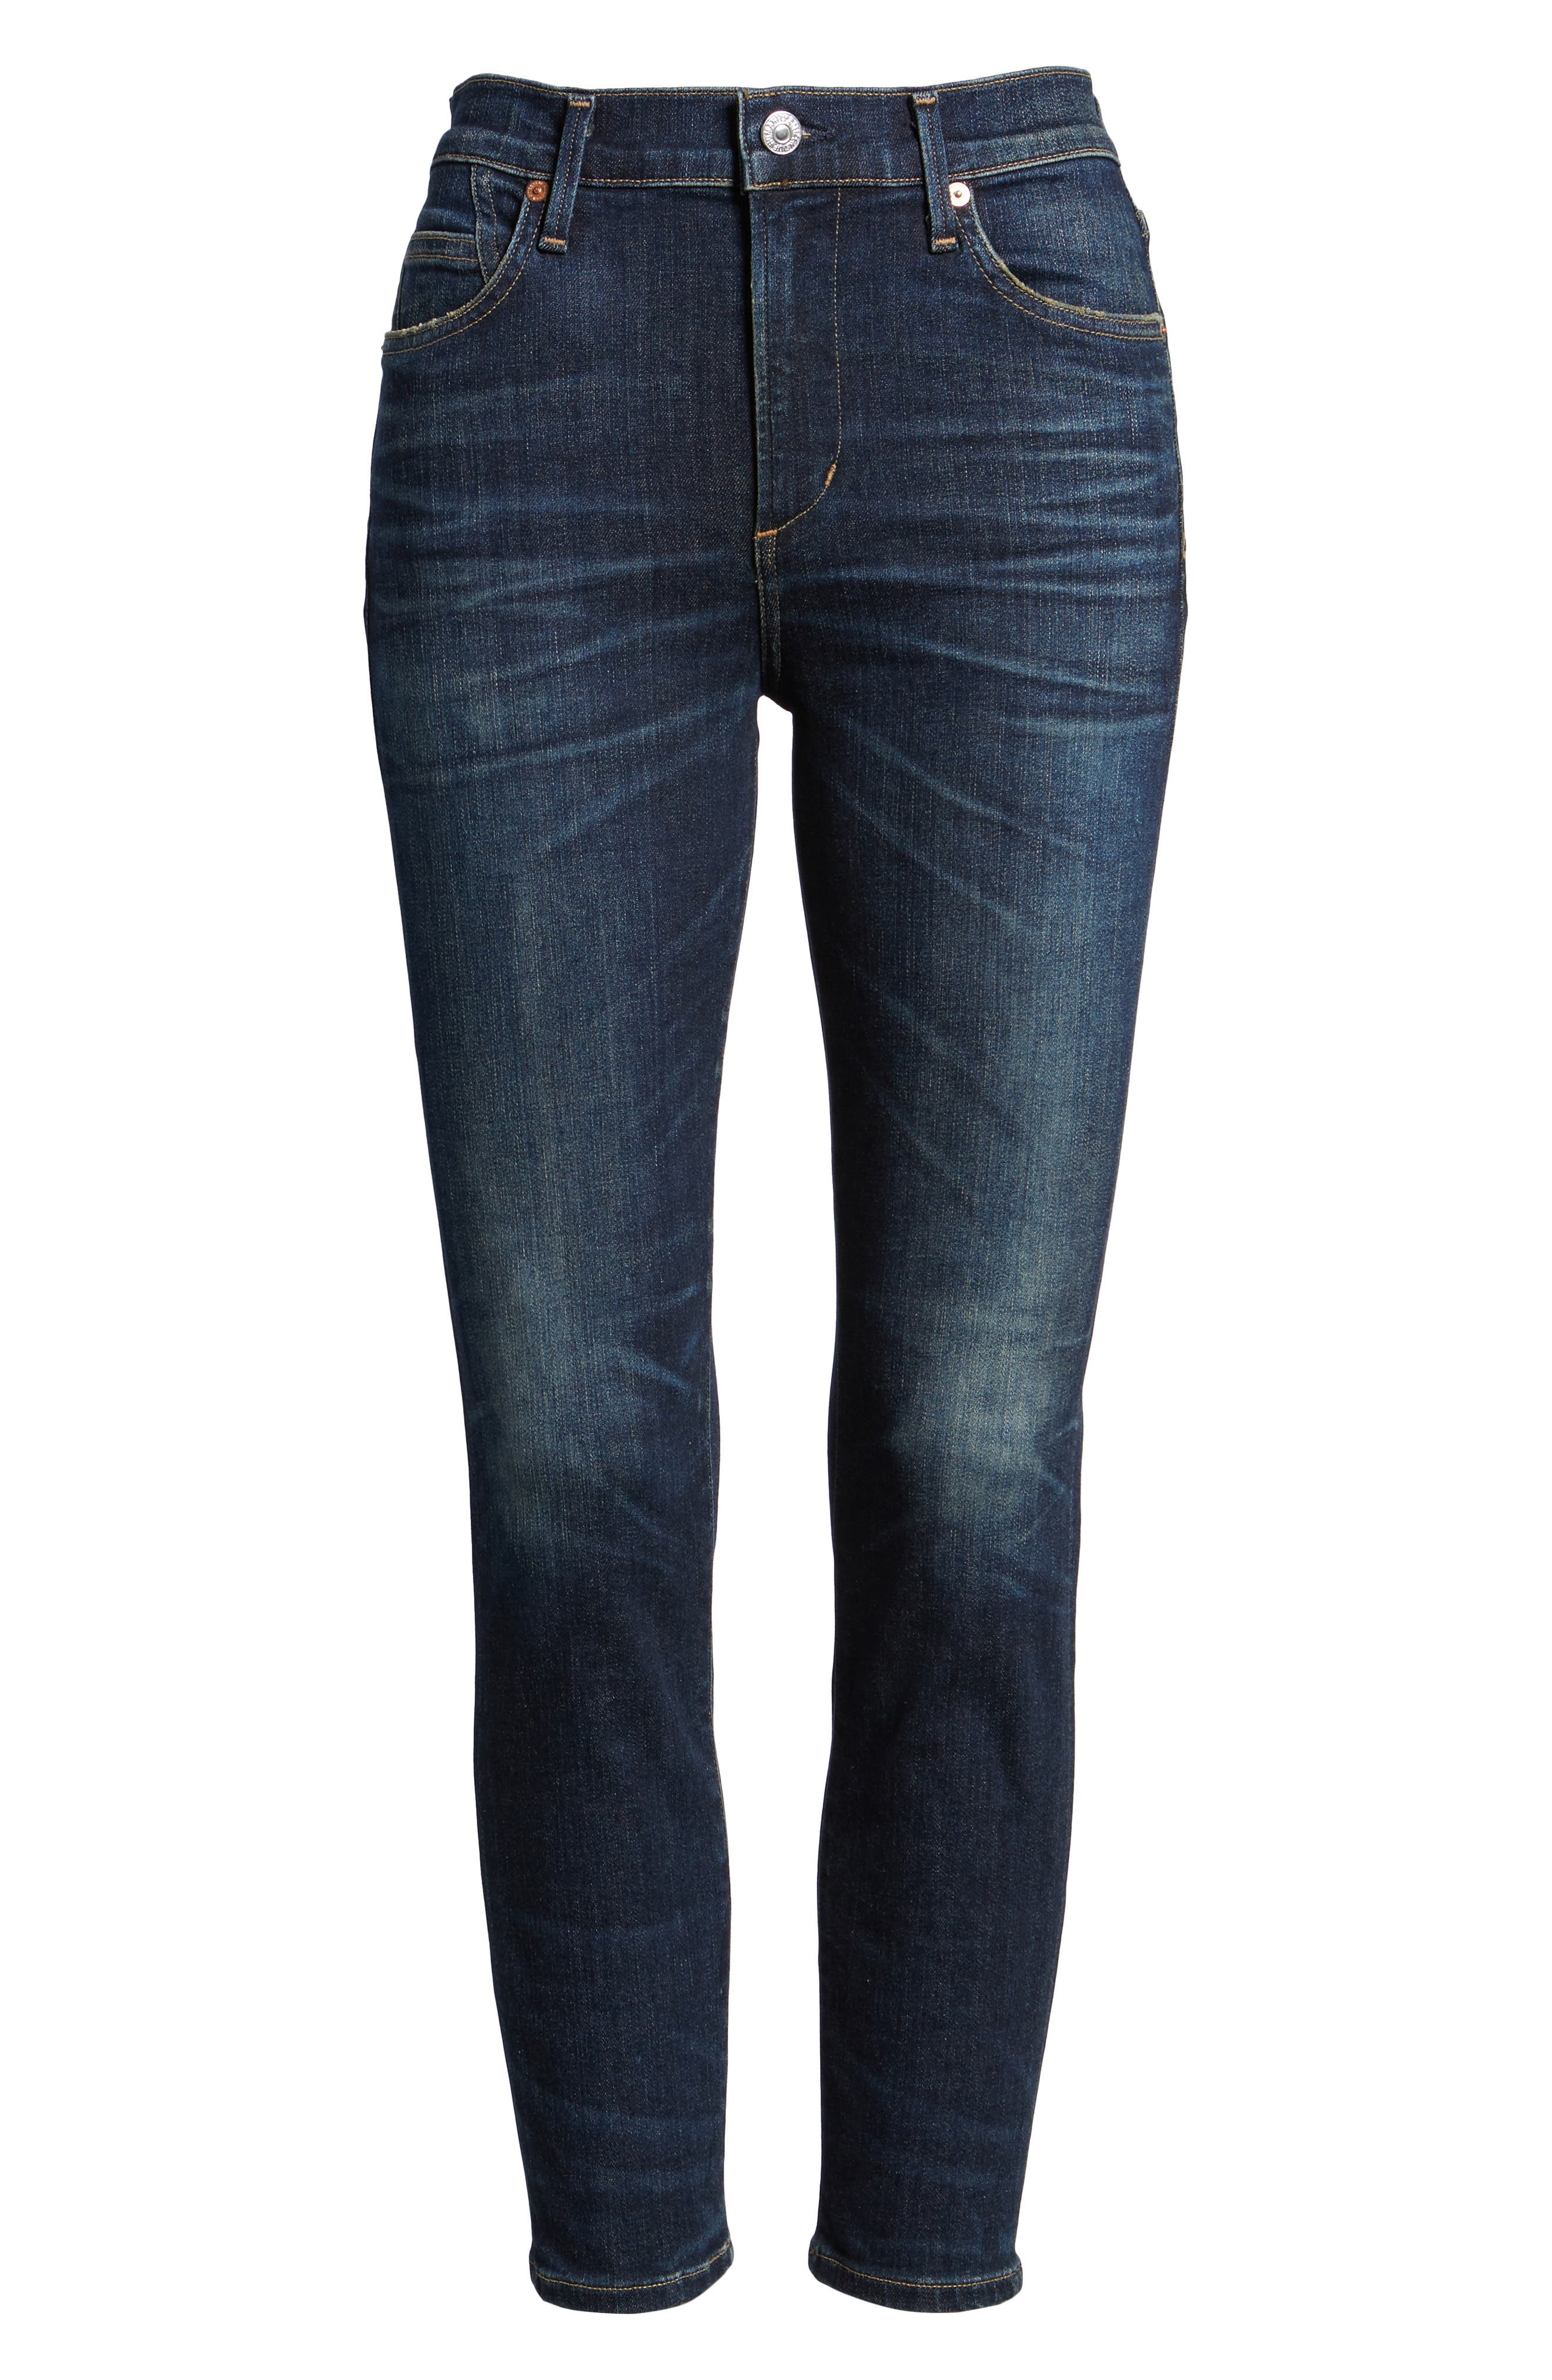 Rocket High Waist Crop Skinny Jeans,                             Main thumbnail 1, color,                             410